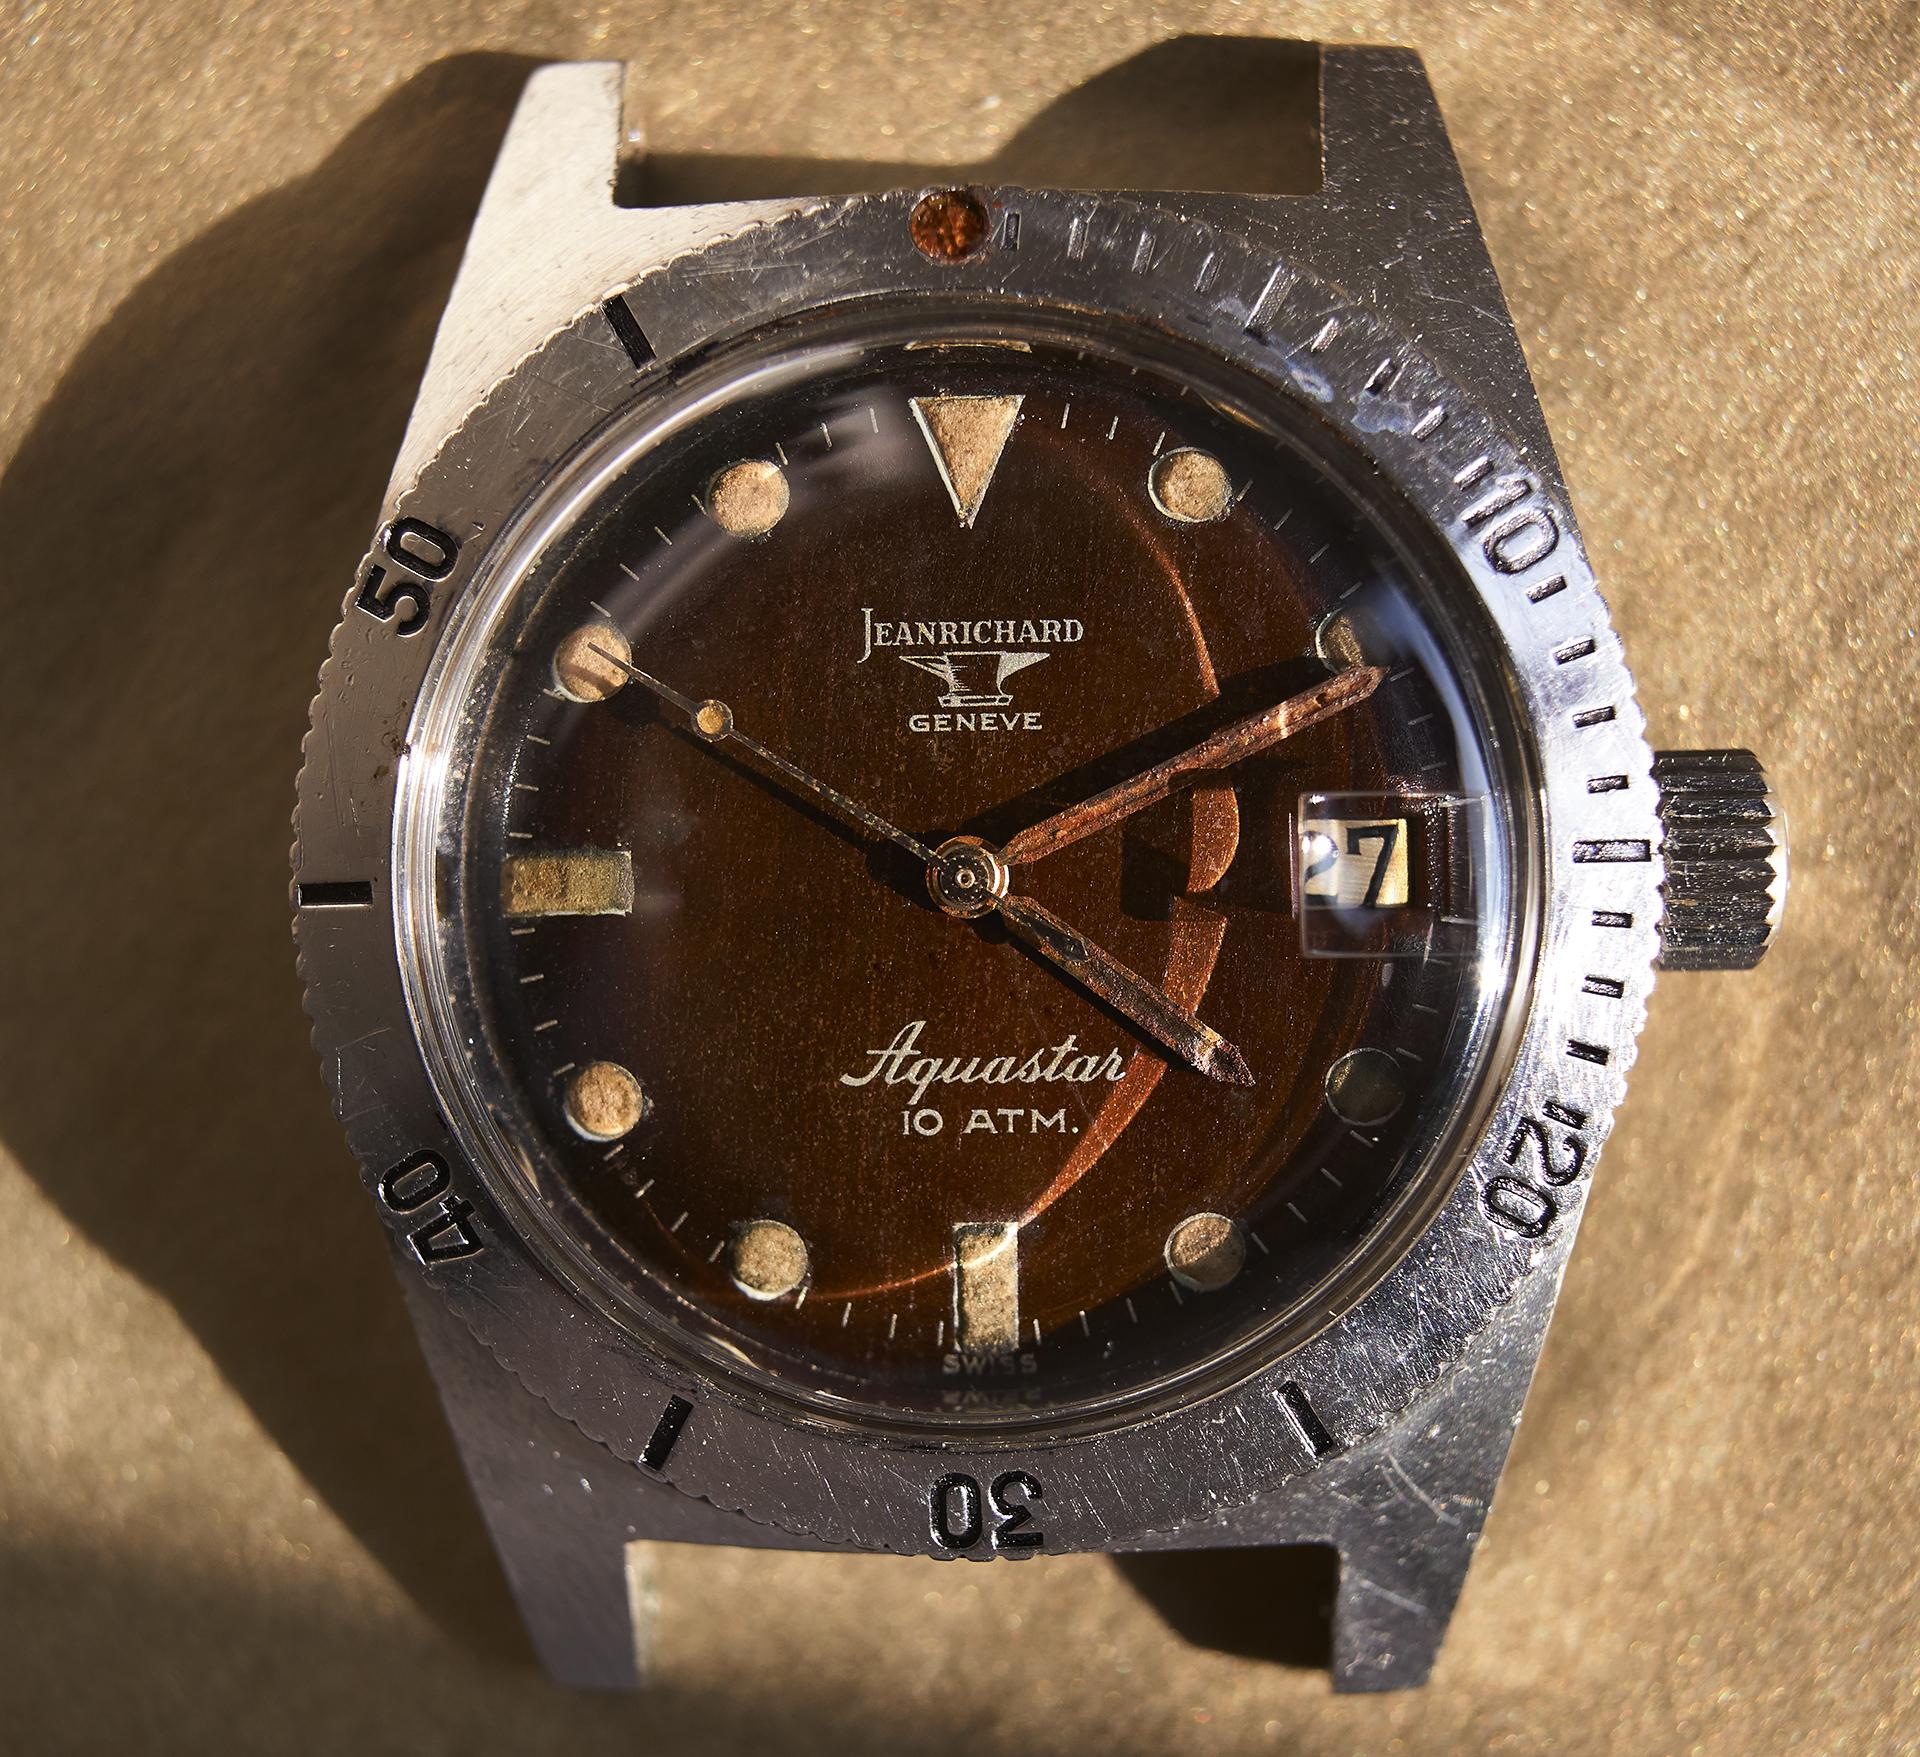 Jean Richard / Aquastar 1701 tropical